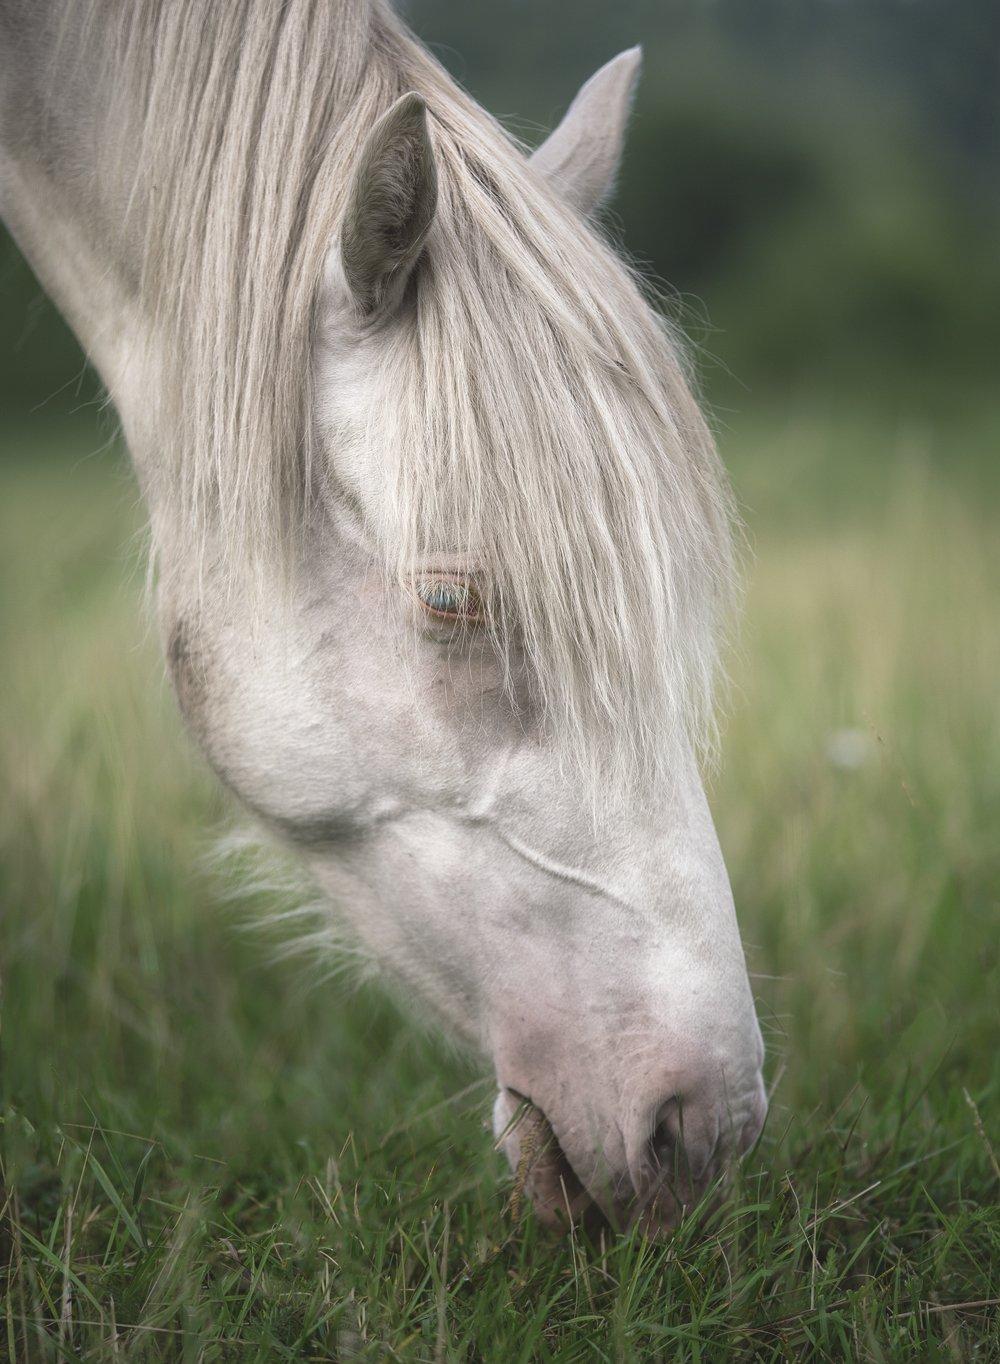 лошади, свет, утро, природа, Баранов Олег